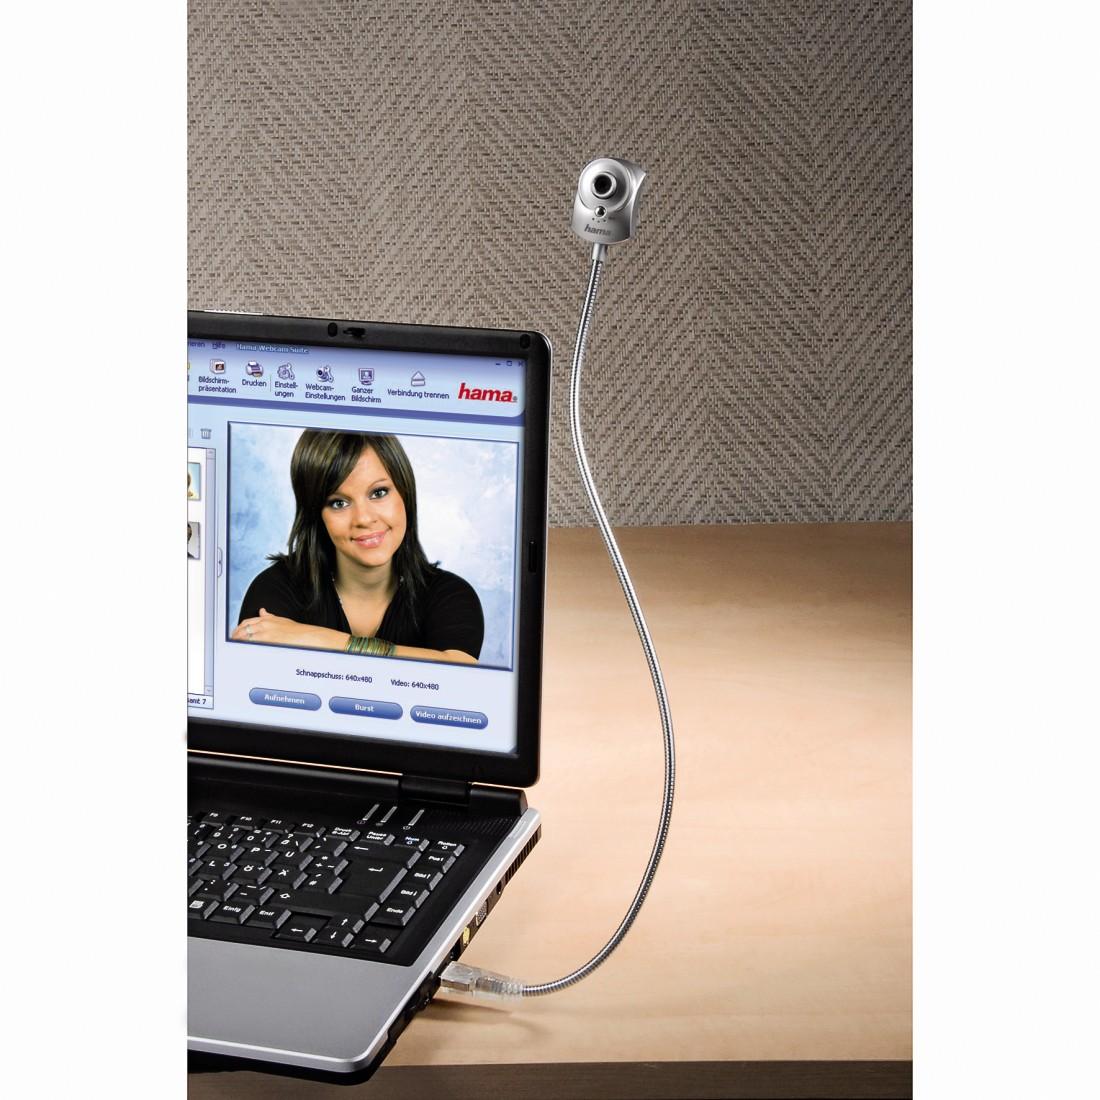 HAMA Snakecam PC Webcam Drivers Download